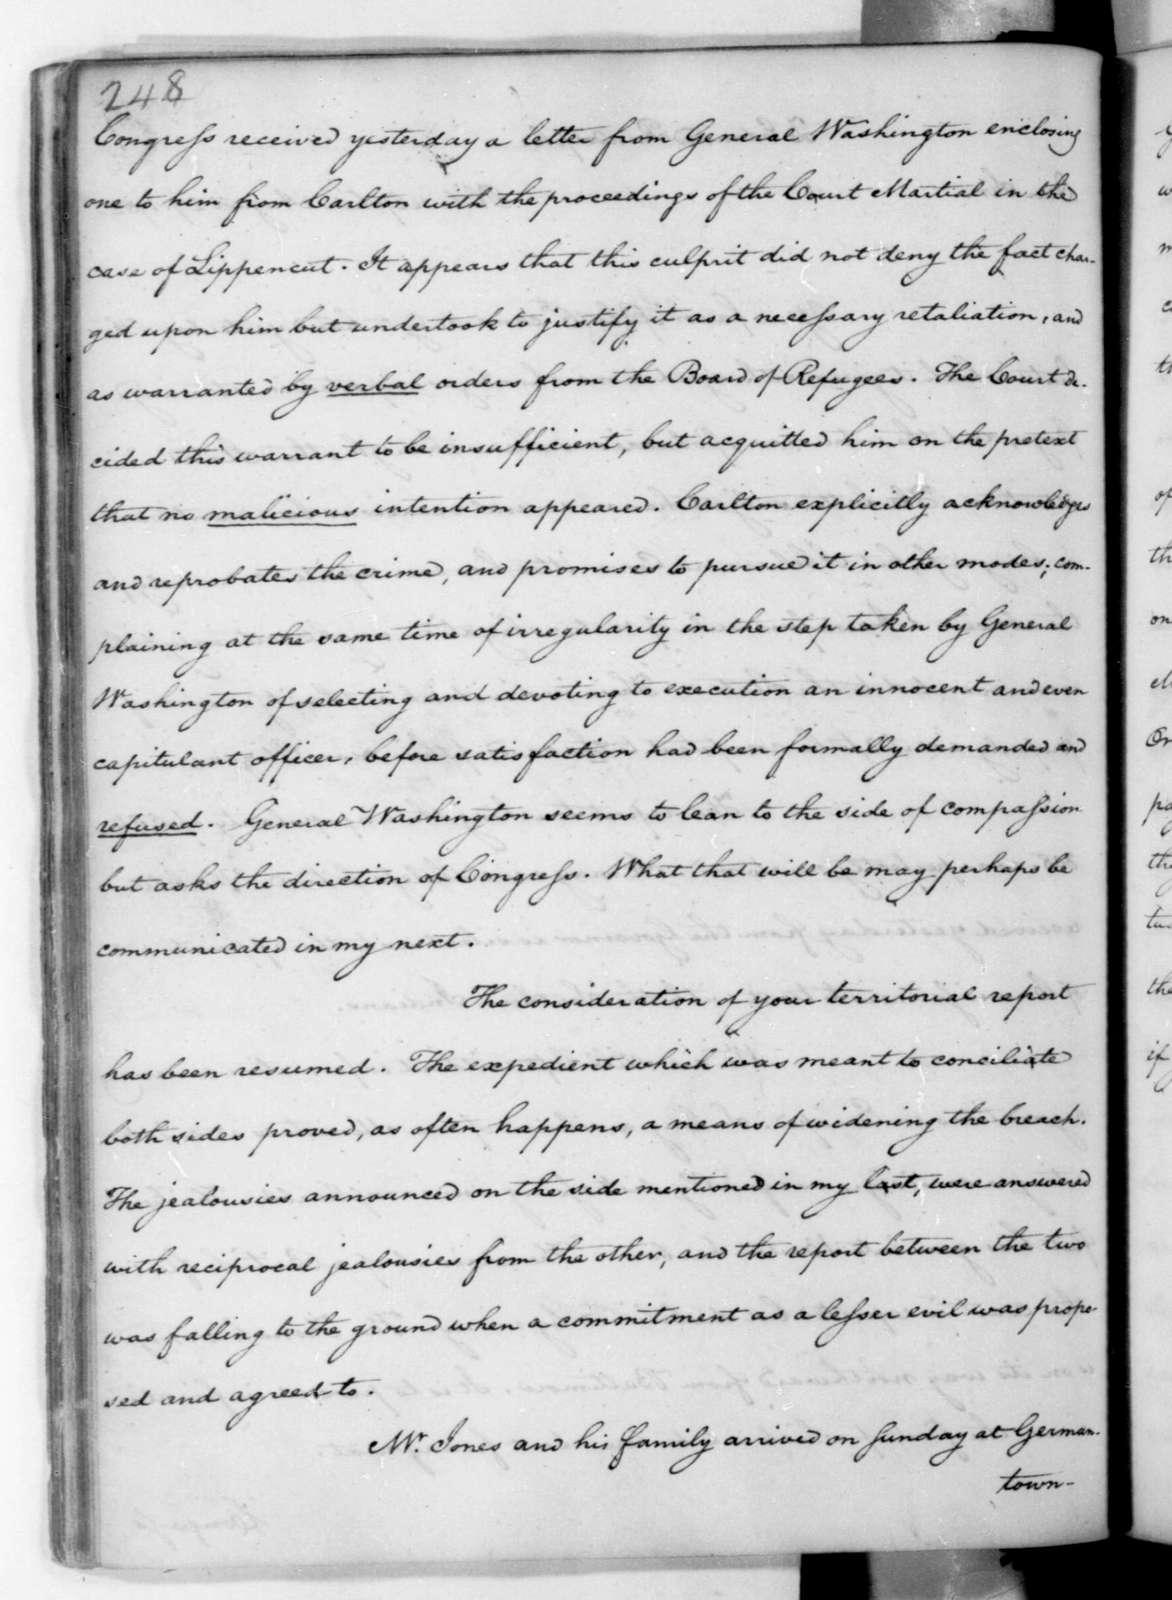 James Madison to Edmund Randolph, August 27, 1782.